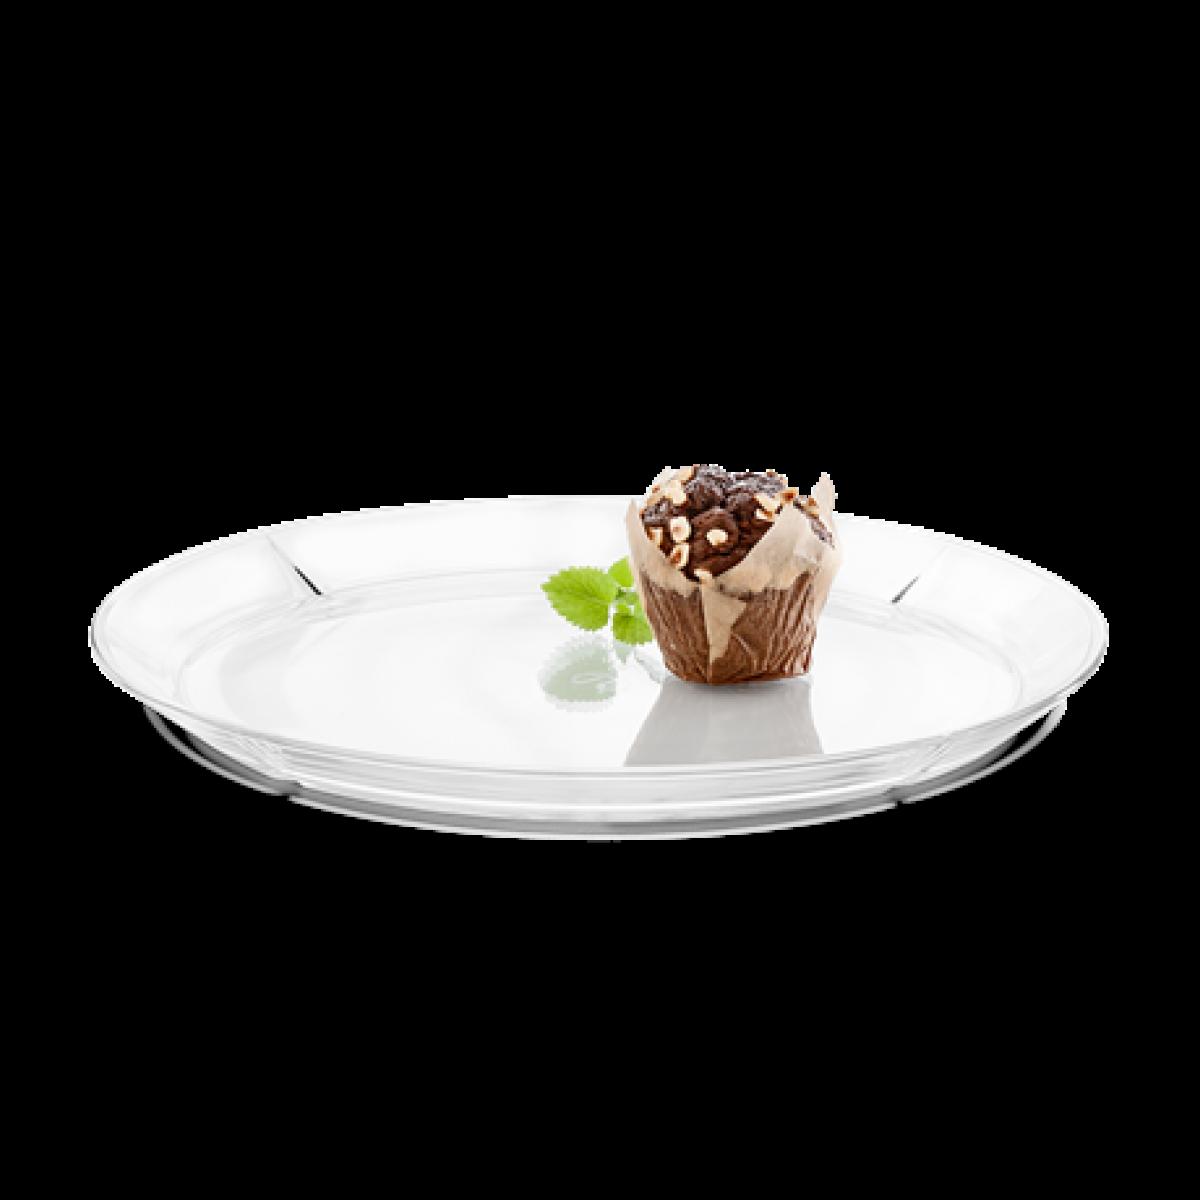 ROSENDAHL Grand Cru serveringsfad 32 cm.(Forudbestilling - forventes på lager sidst i Januar 2022)